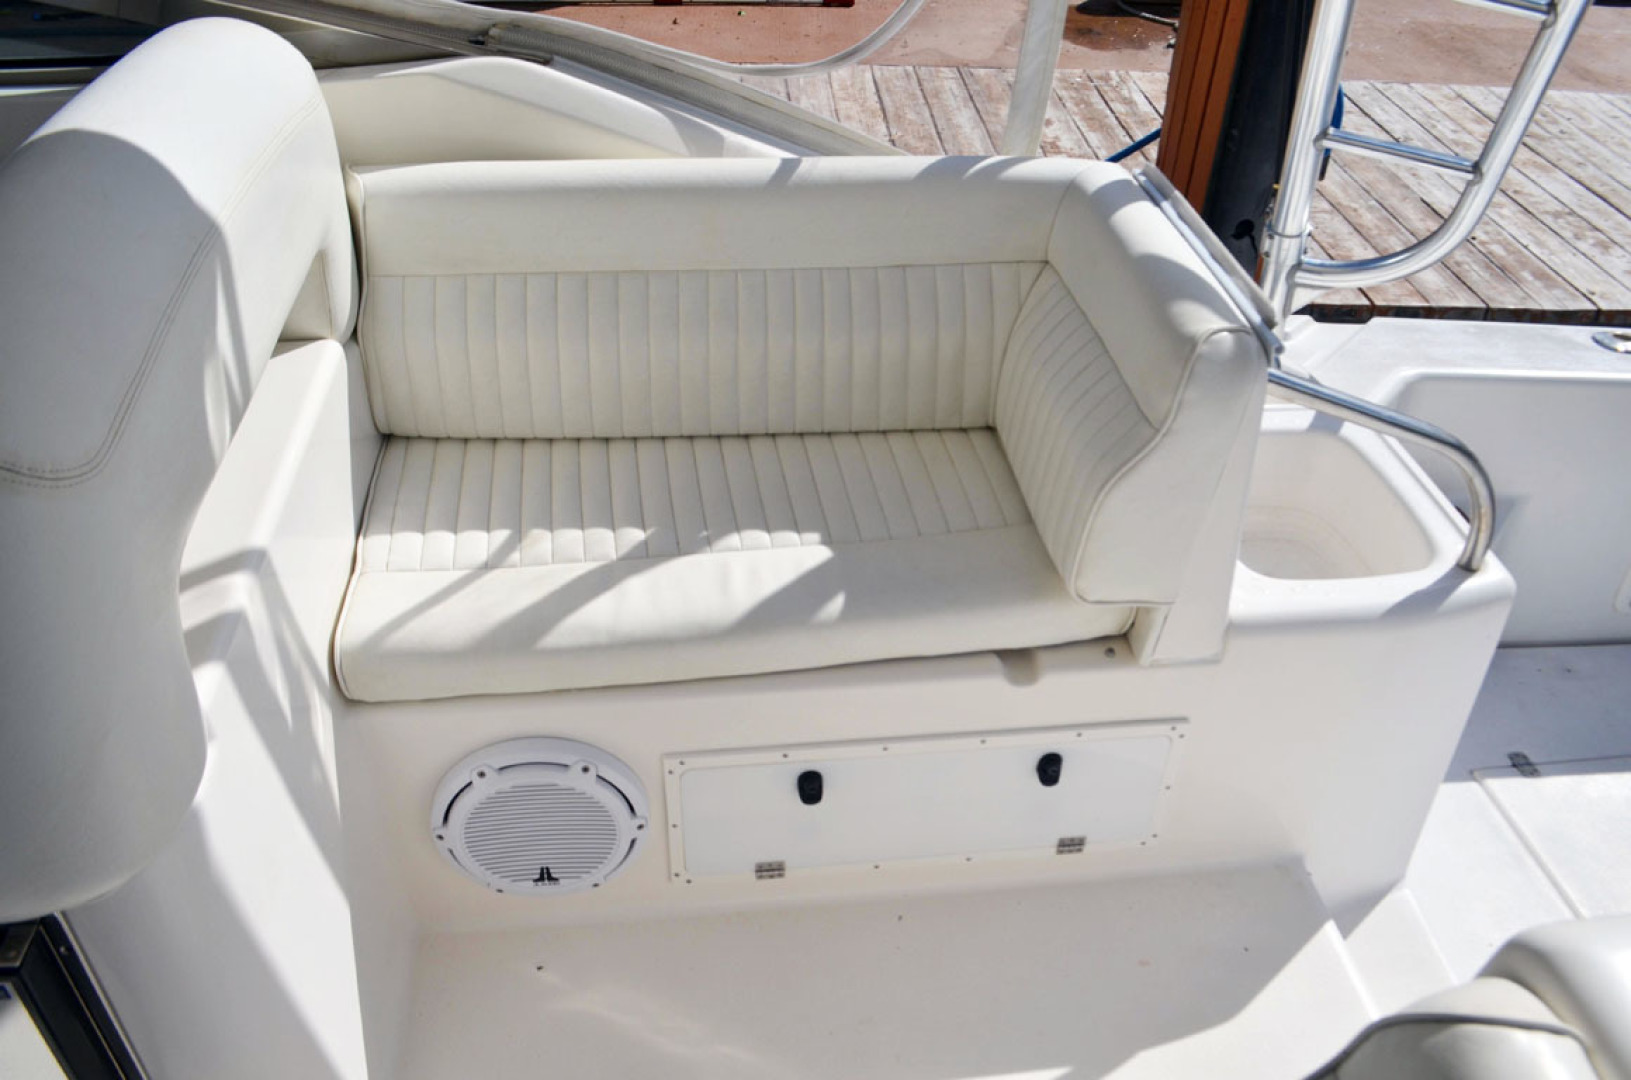 Riviera-4000 Express 2001-Shady Lady Hampton Bays-New York-United States-Helm Seating And Ice Maker-1547560 | Thumbnail